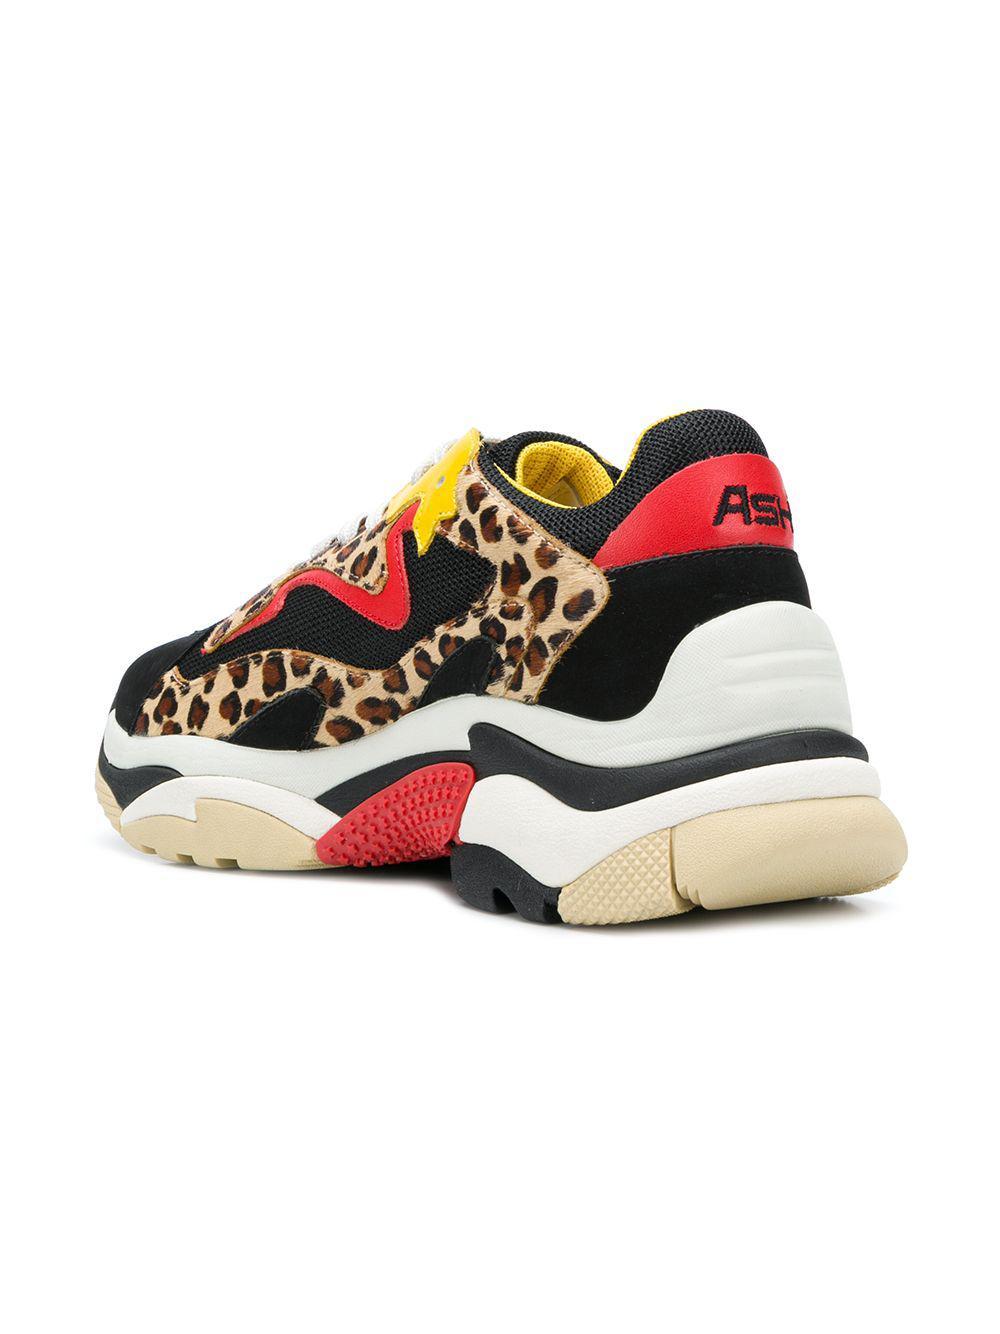 574ff9f55aca3 Lyst - Ash Leopard Lace-up Sneakers in Black